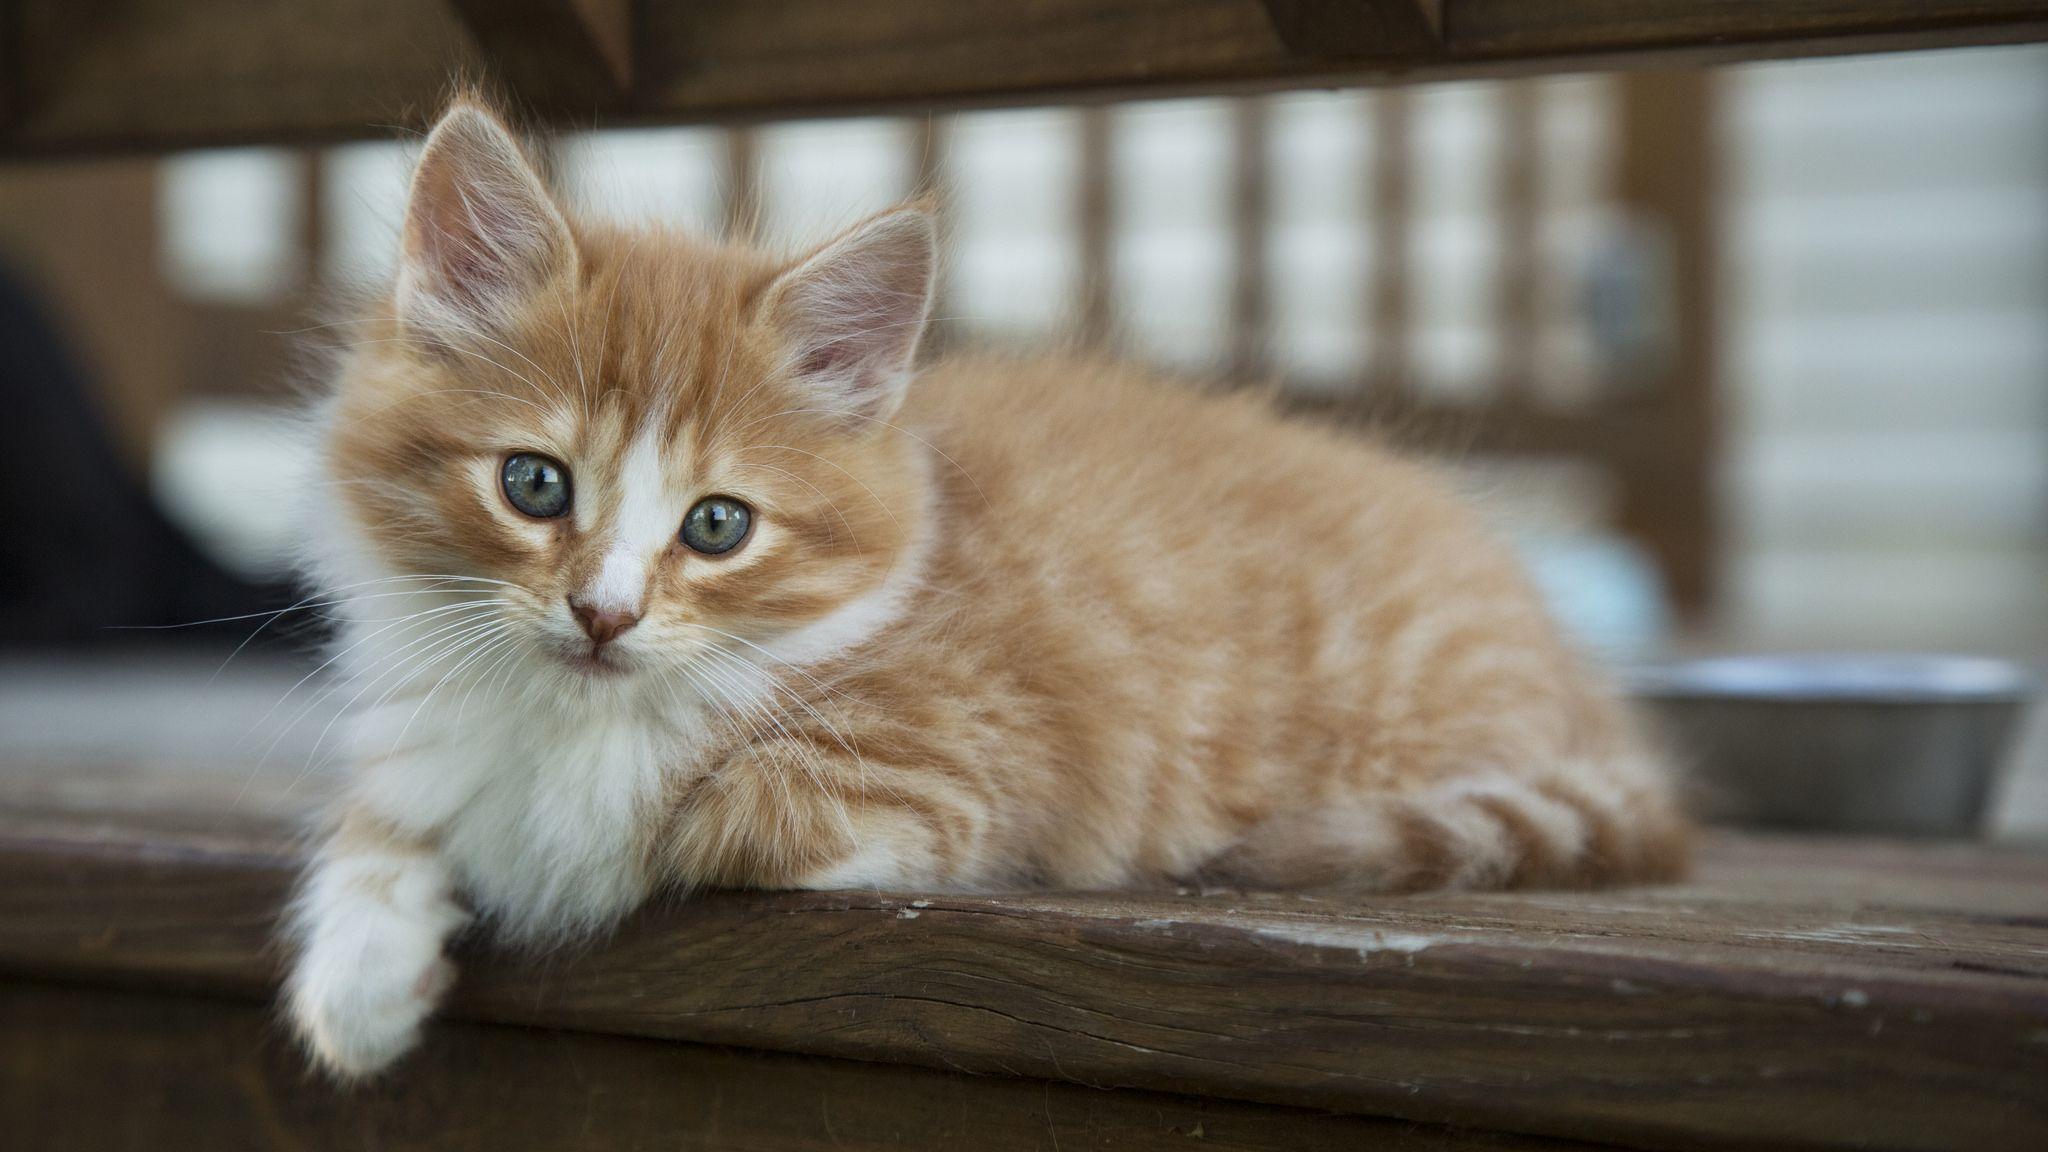 Rowdy8 Kittens Cutest Pretty Cats Cute Cats Kittens